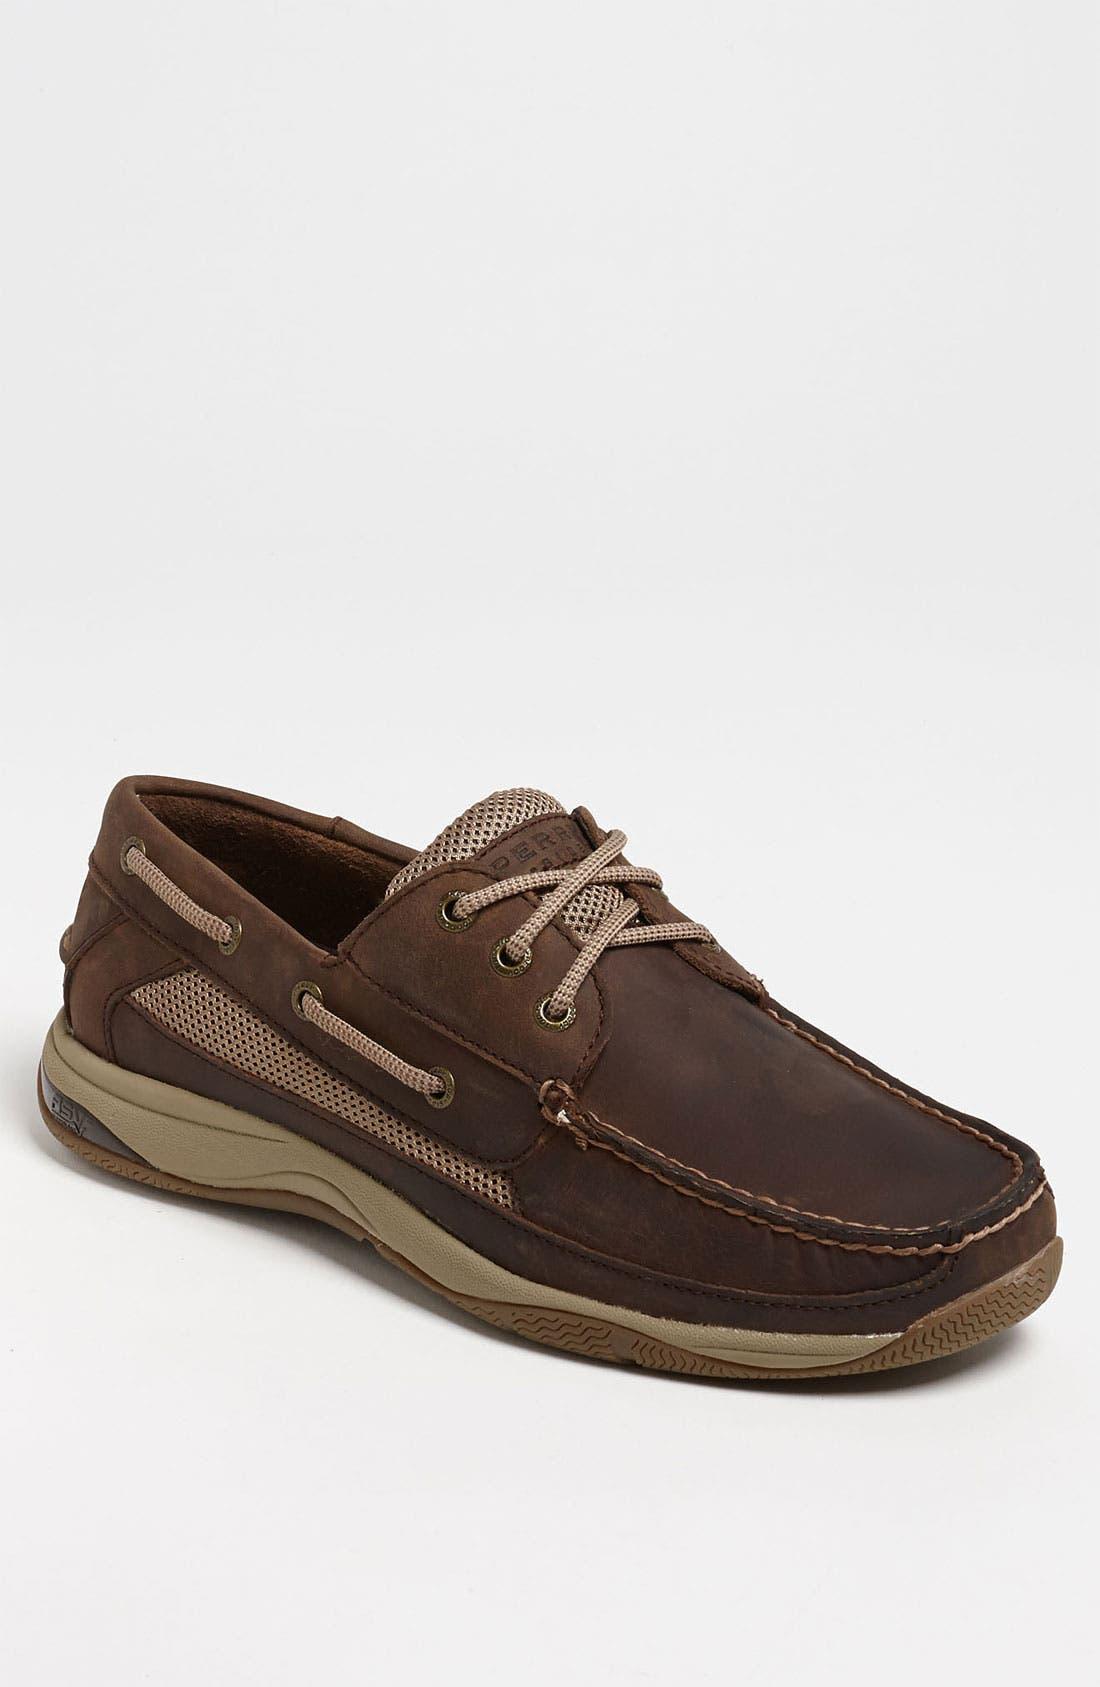 Main Image - Sperry Top-Sider® 'Billfish' Boat Shoe